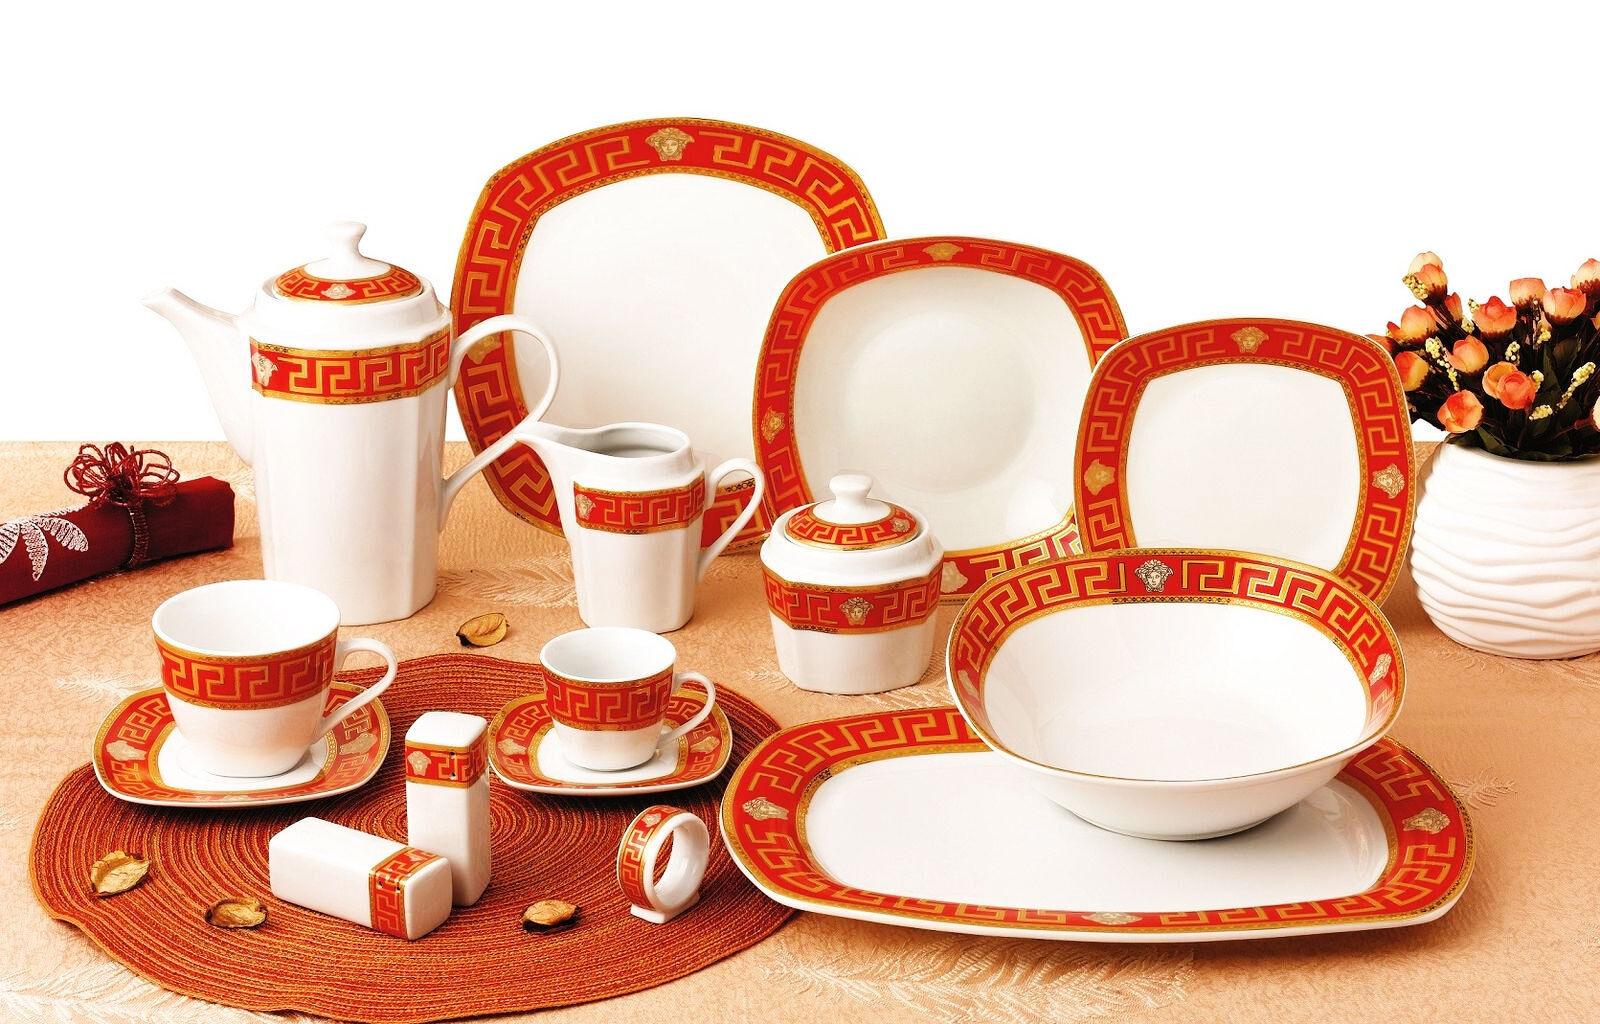 57 tlg Porzellan Porzellan Porzellan Tafelservice Medusa Maeander Dinner Set ROT --VERSA-- 8f2514